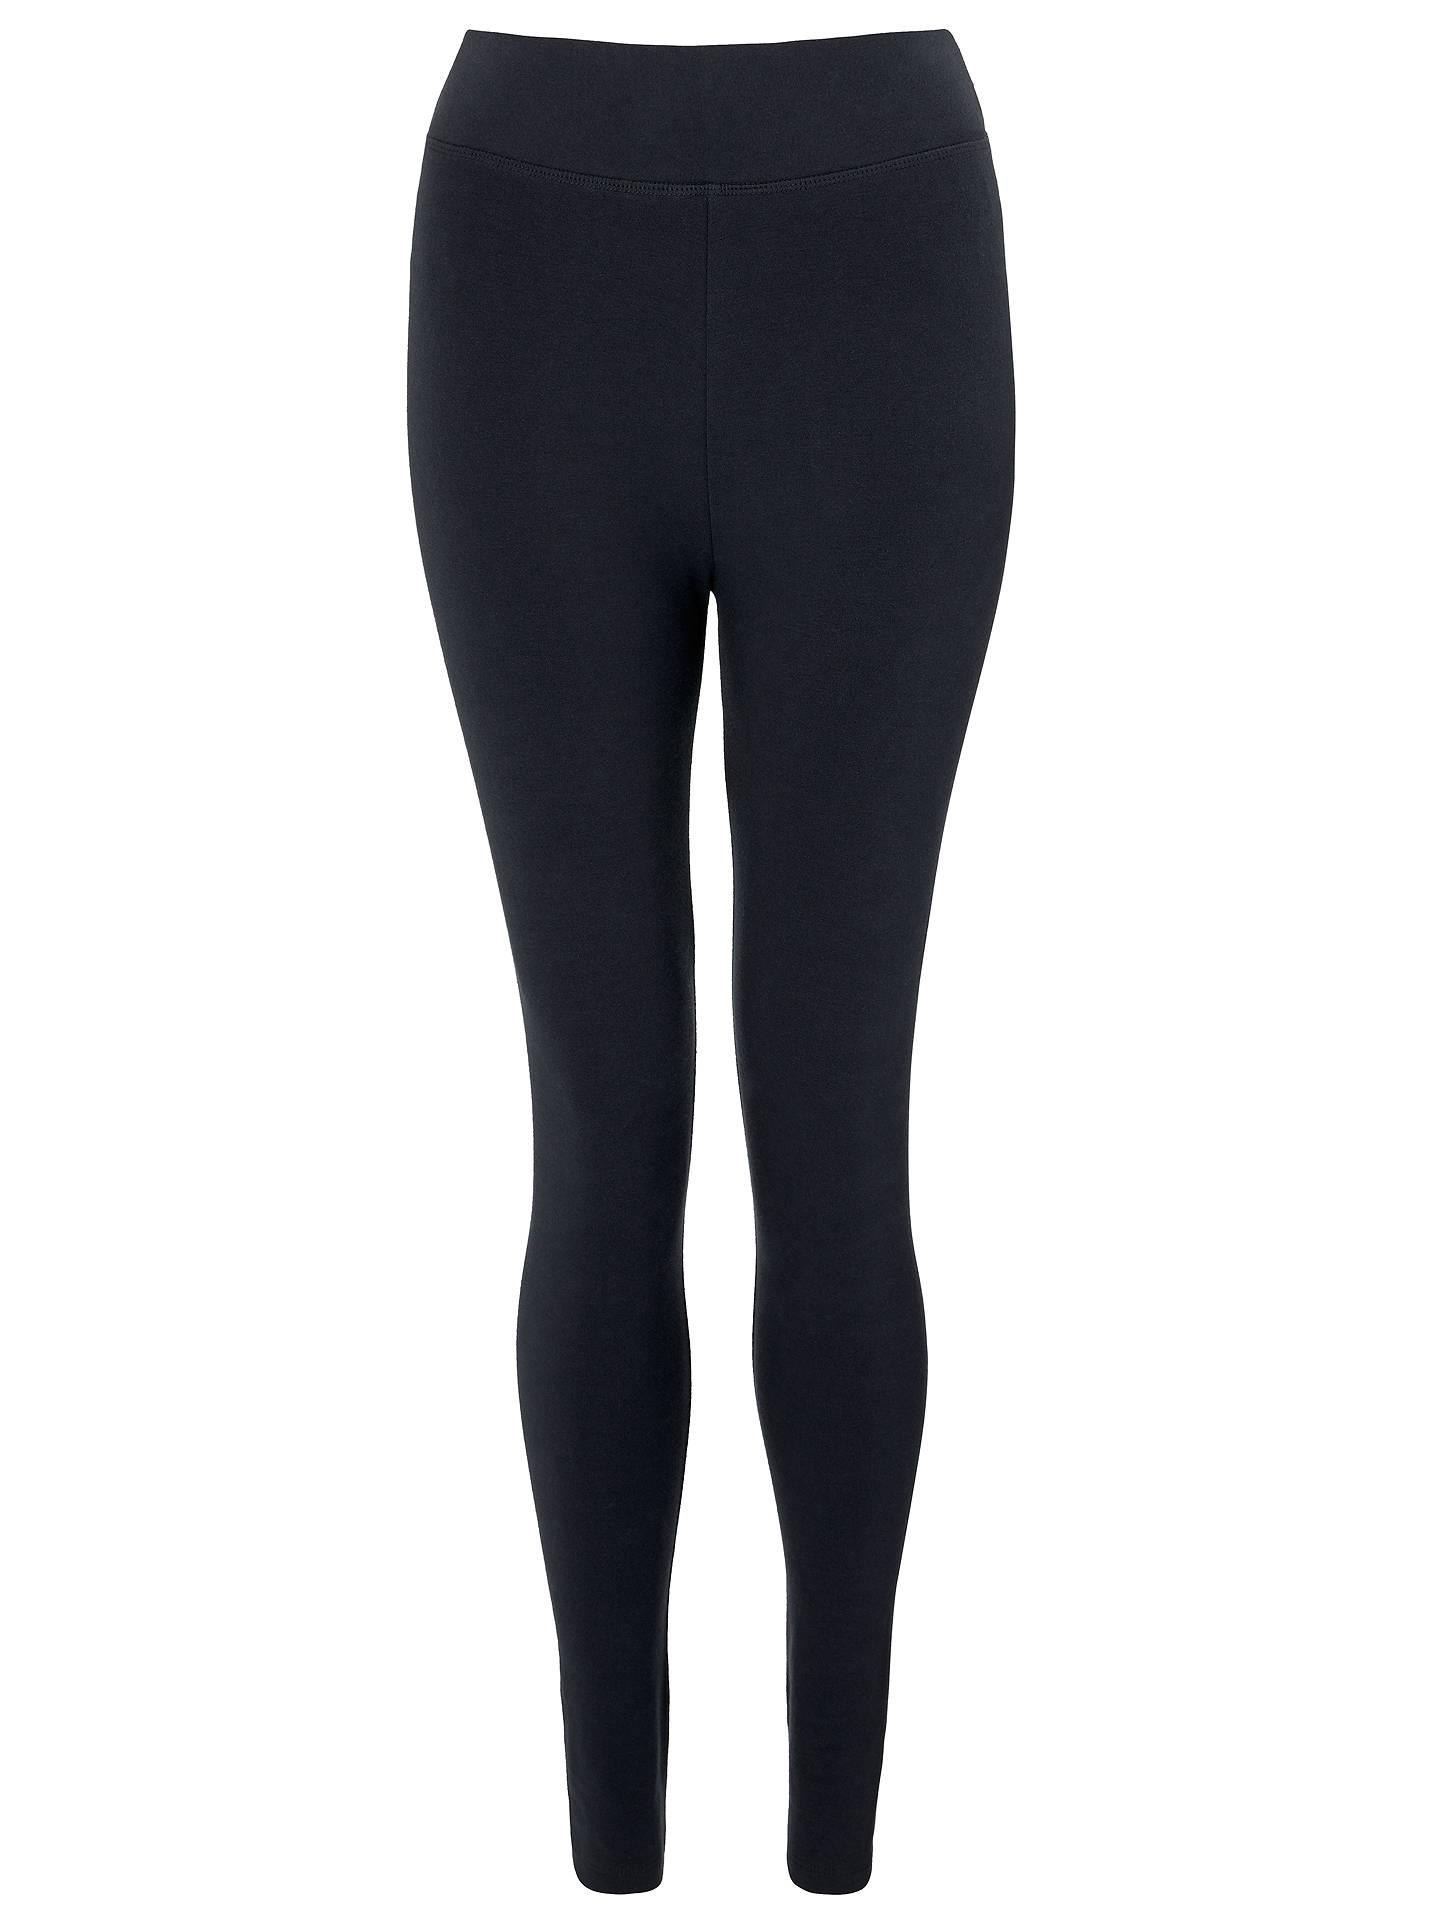 36a73e269515 ... Buy Seasalt Sea-Legs Leggings, Orca, 8 Online at johnlewis.com ...